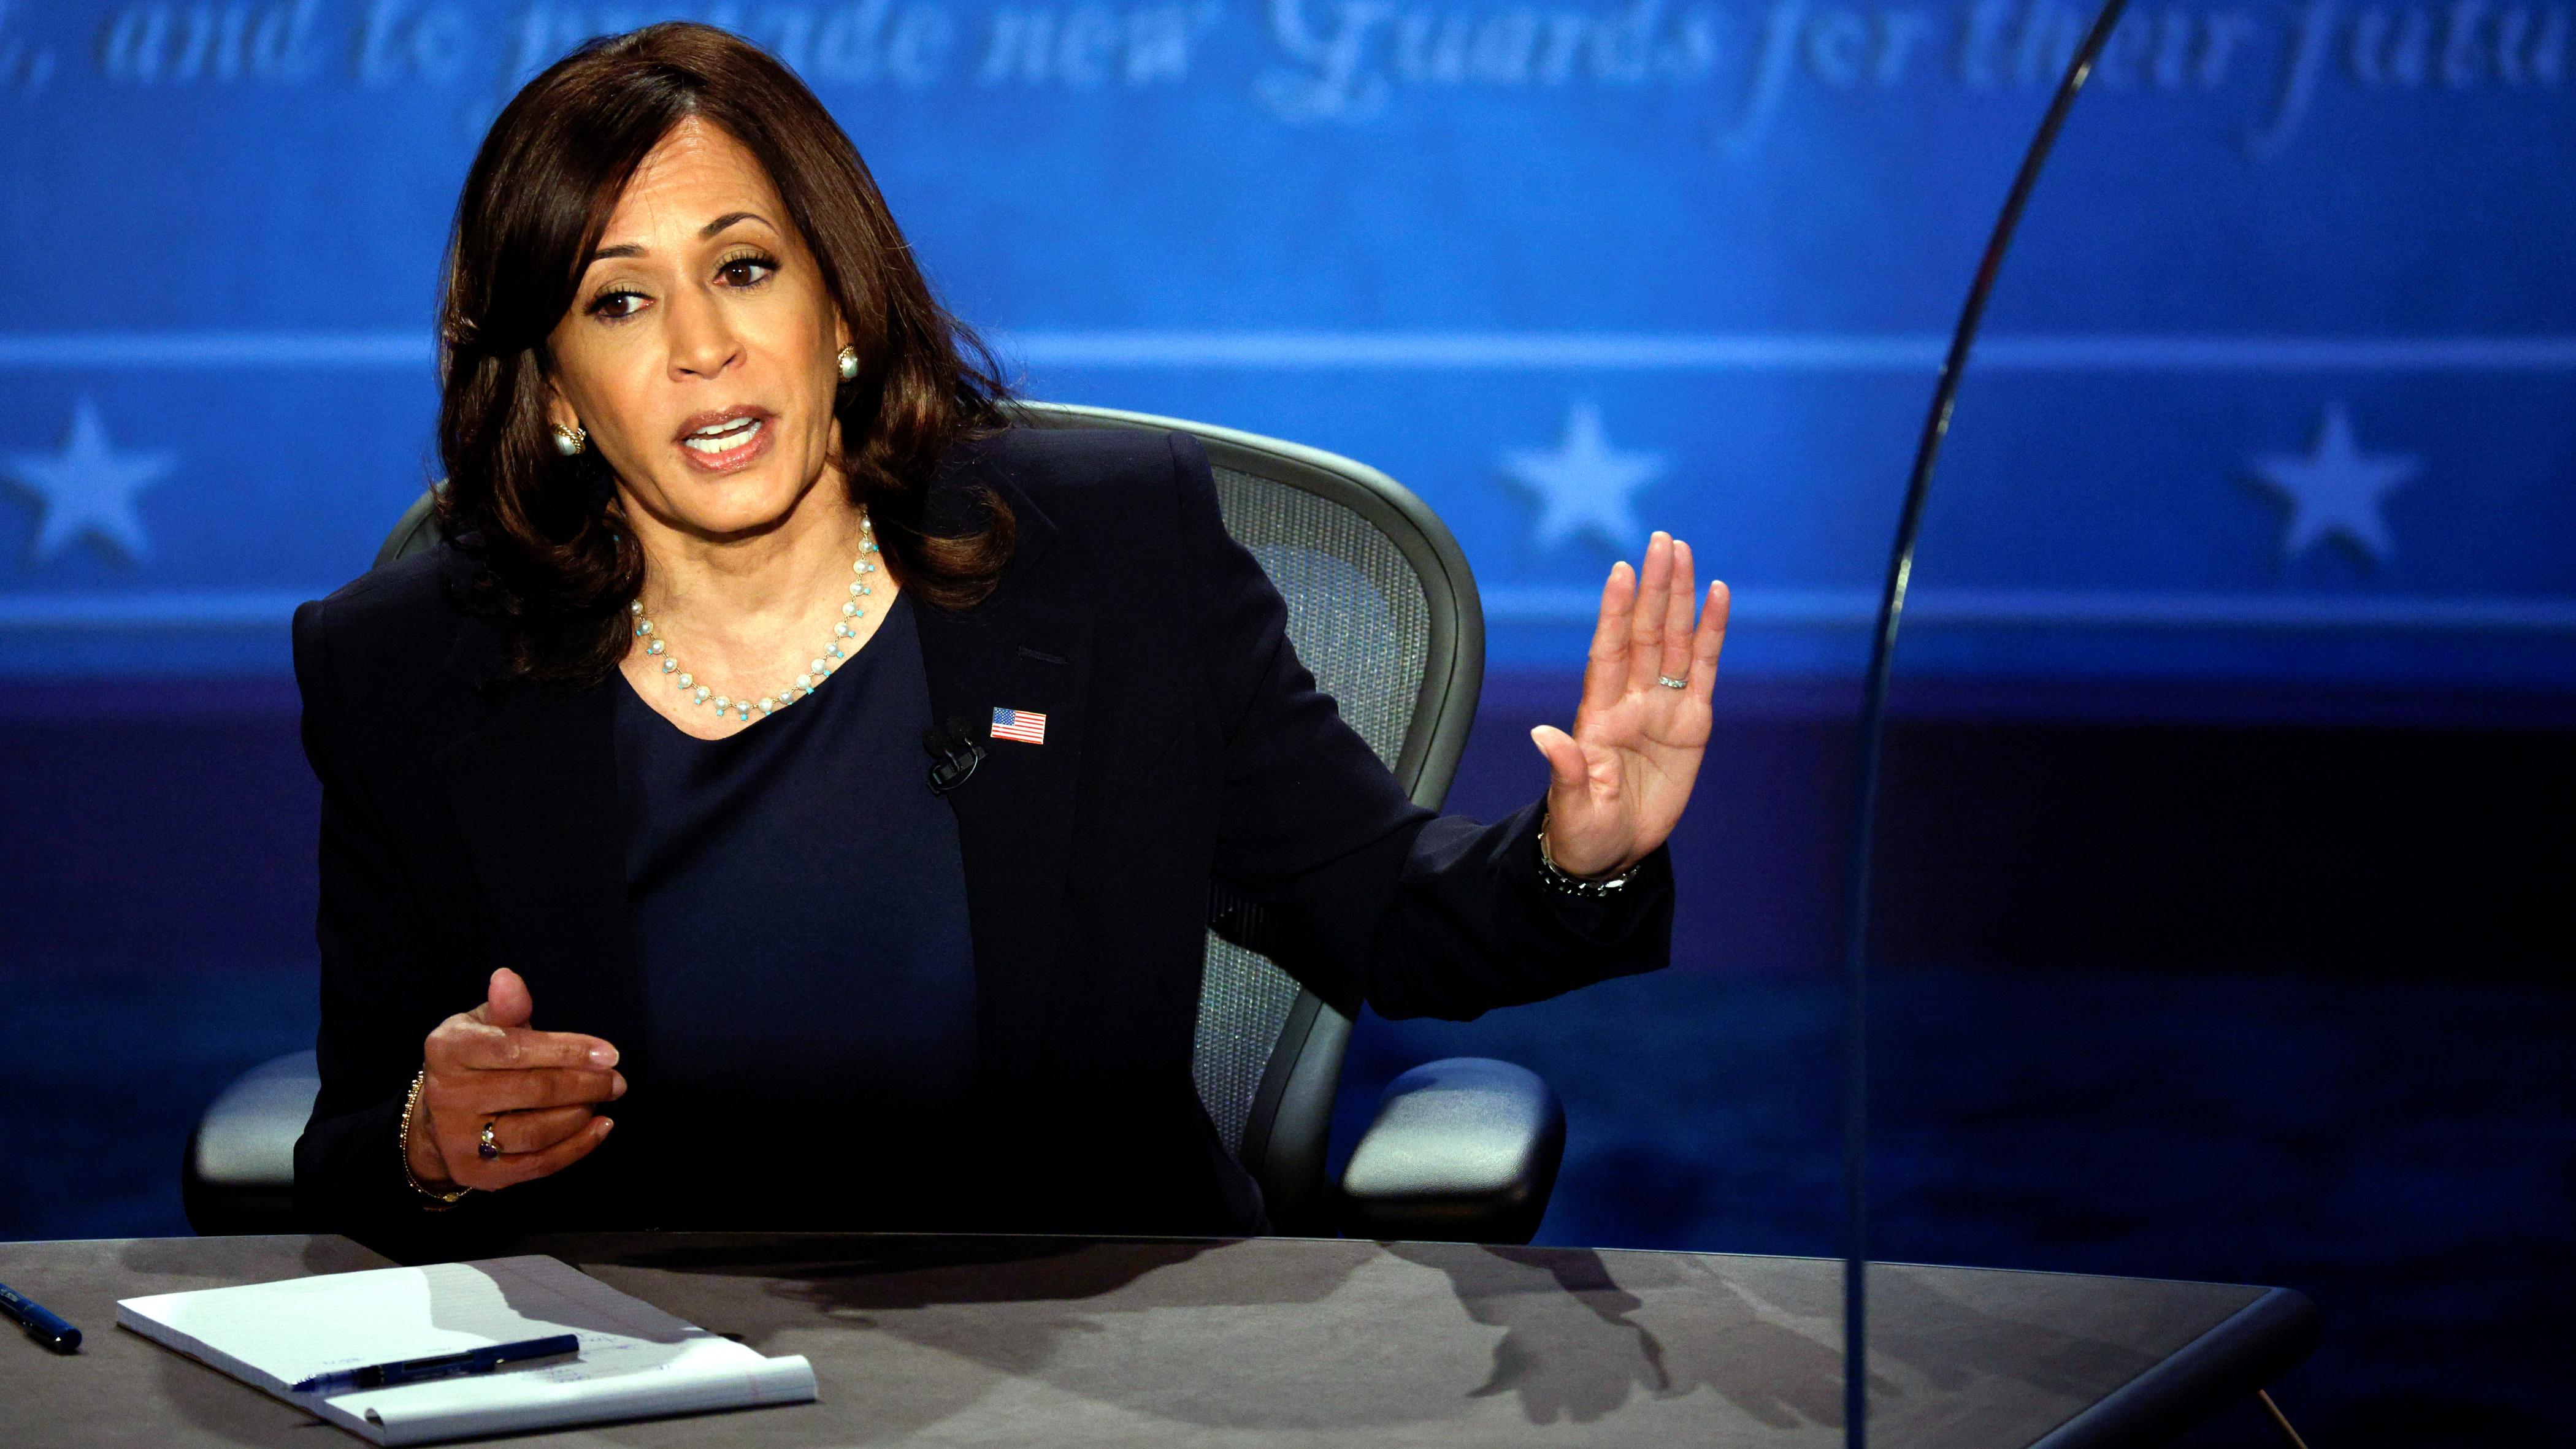 Democratic vice presidential nominee Senator Kamala Harris speaks during the vice presidential campaign debate